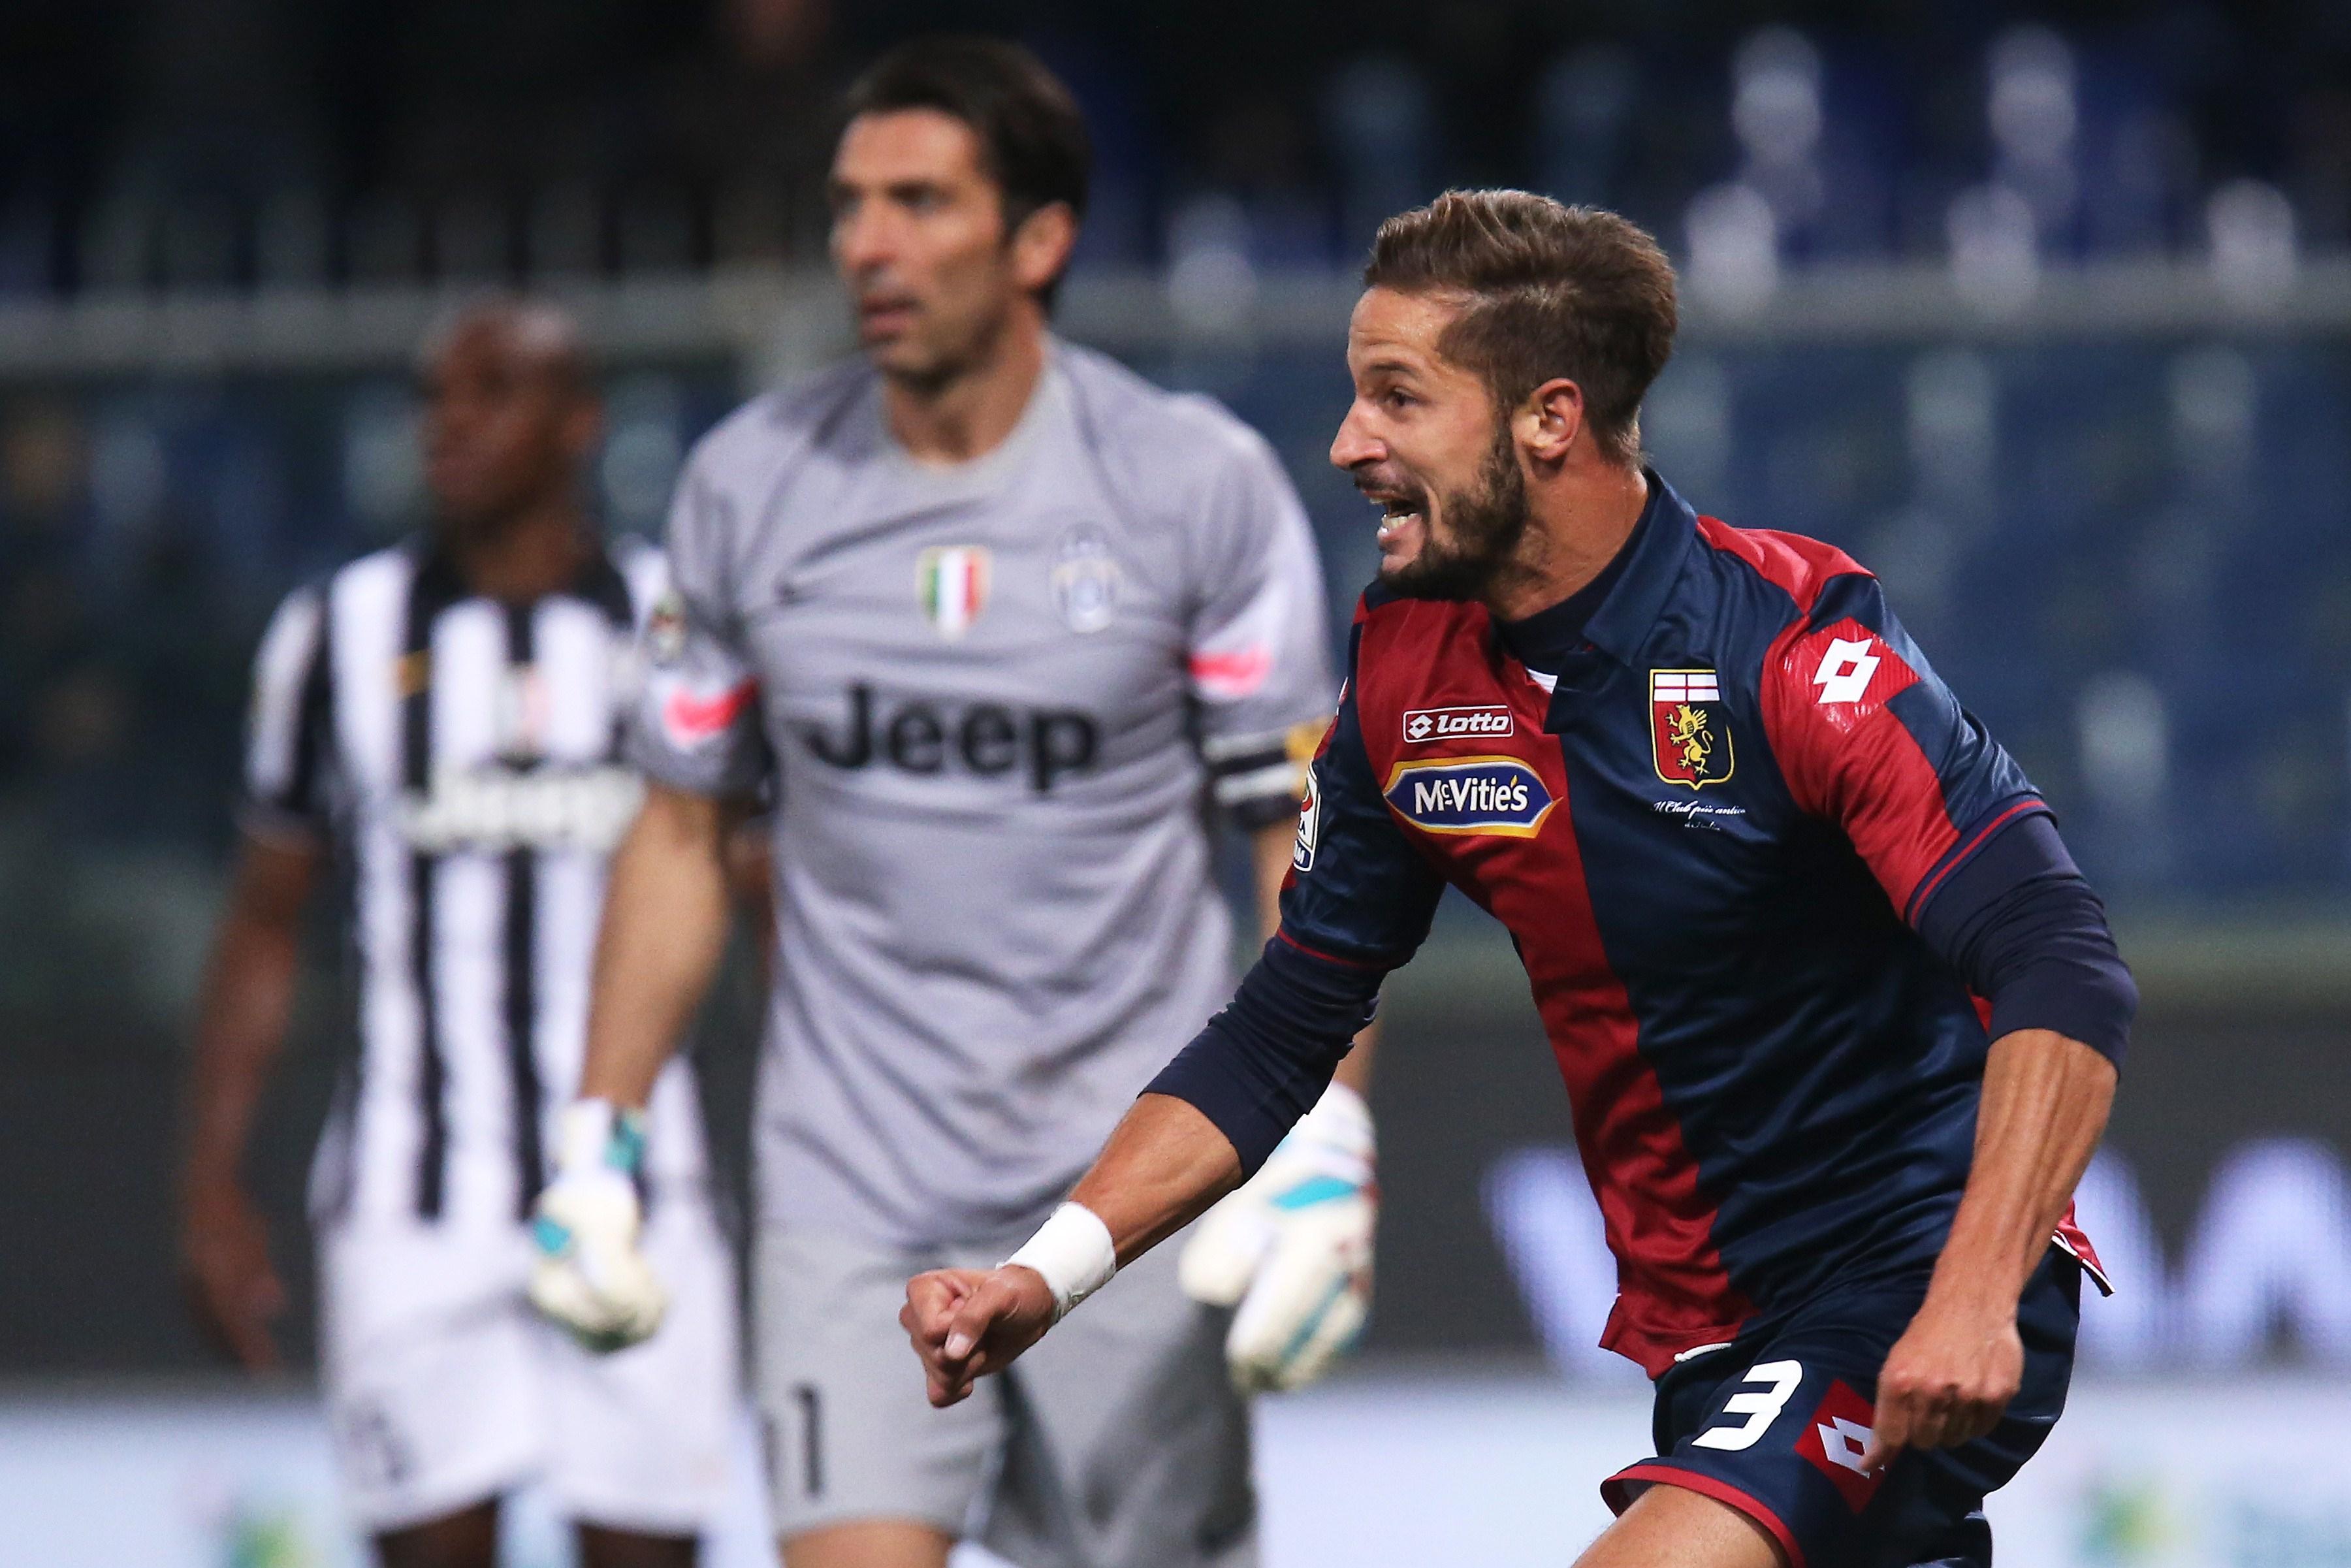 Antonini festeggia il gol contro la Juventus